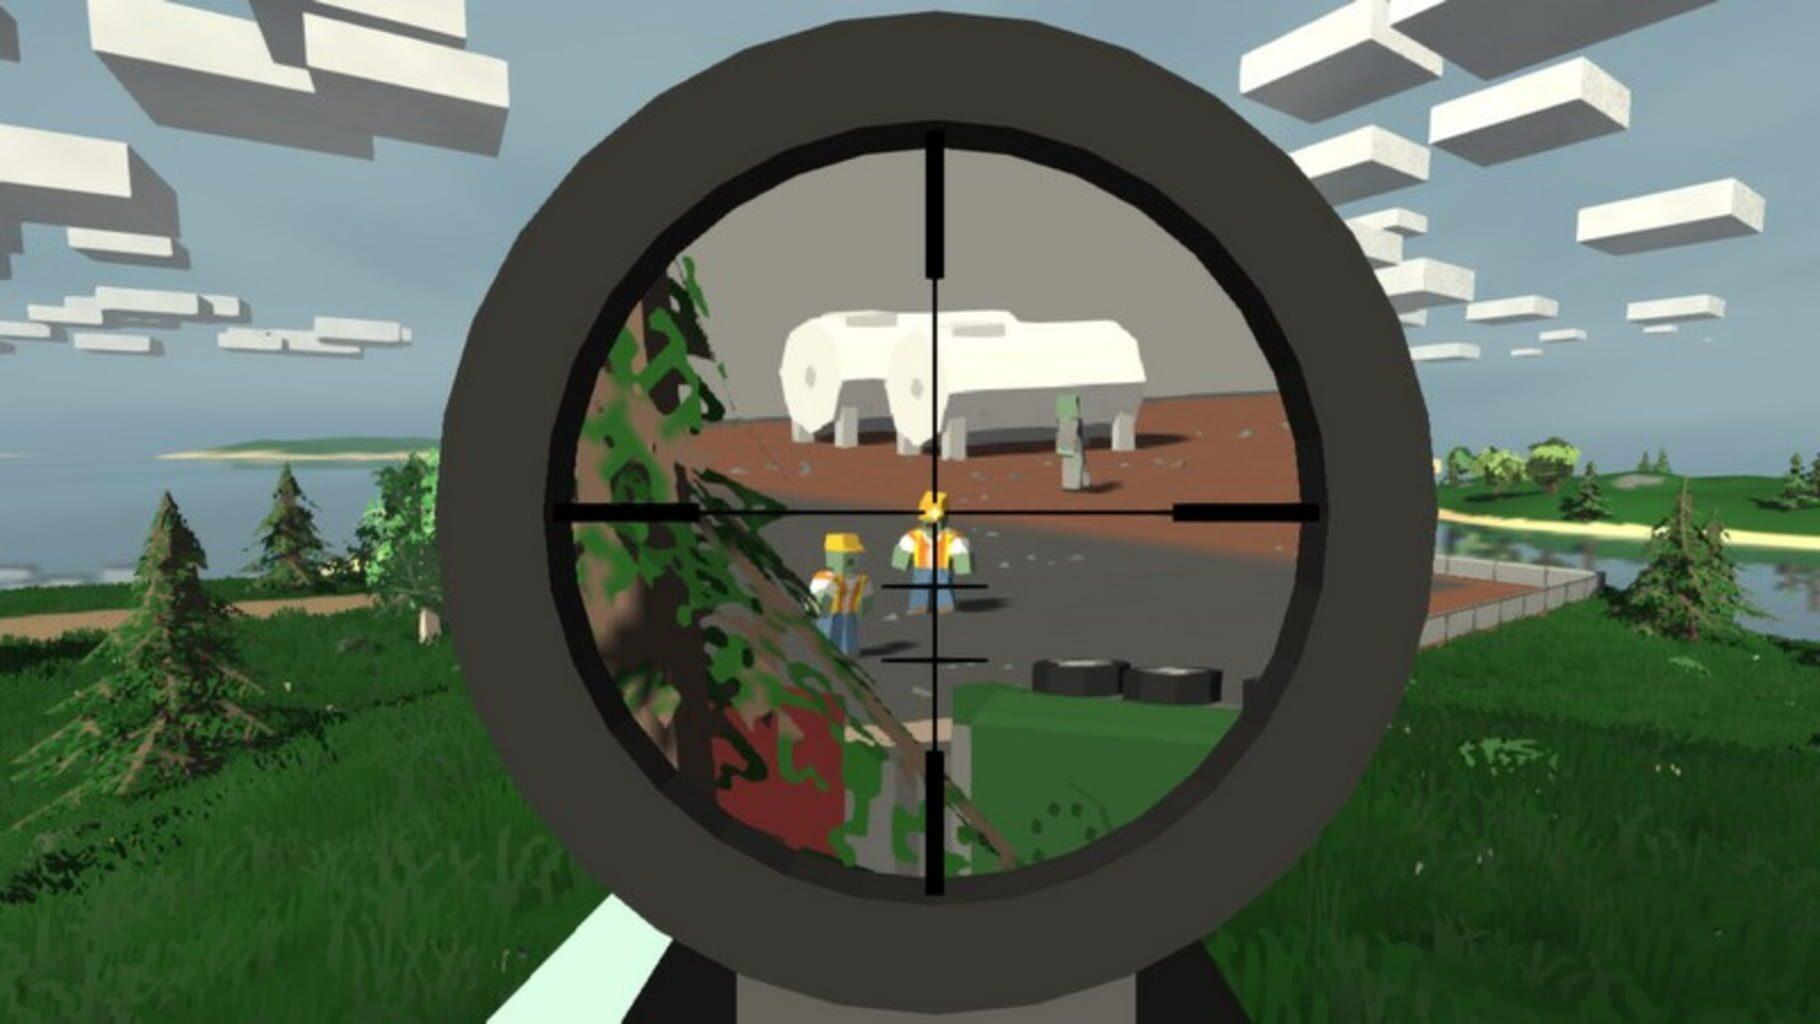 Gameplay Screenshot from Unturned